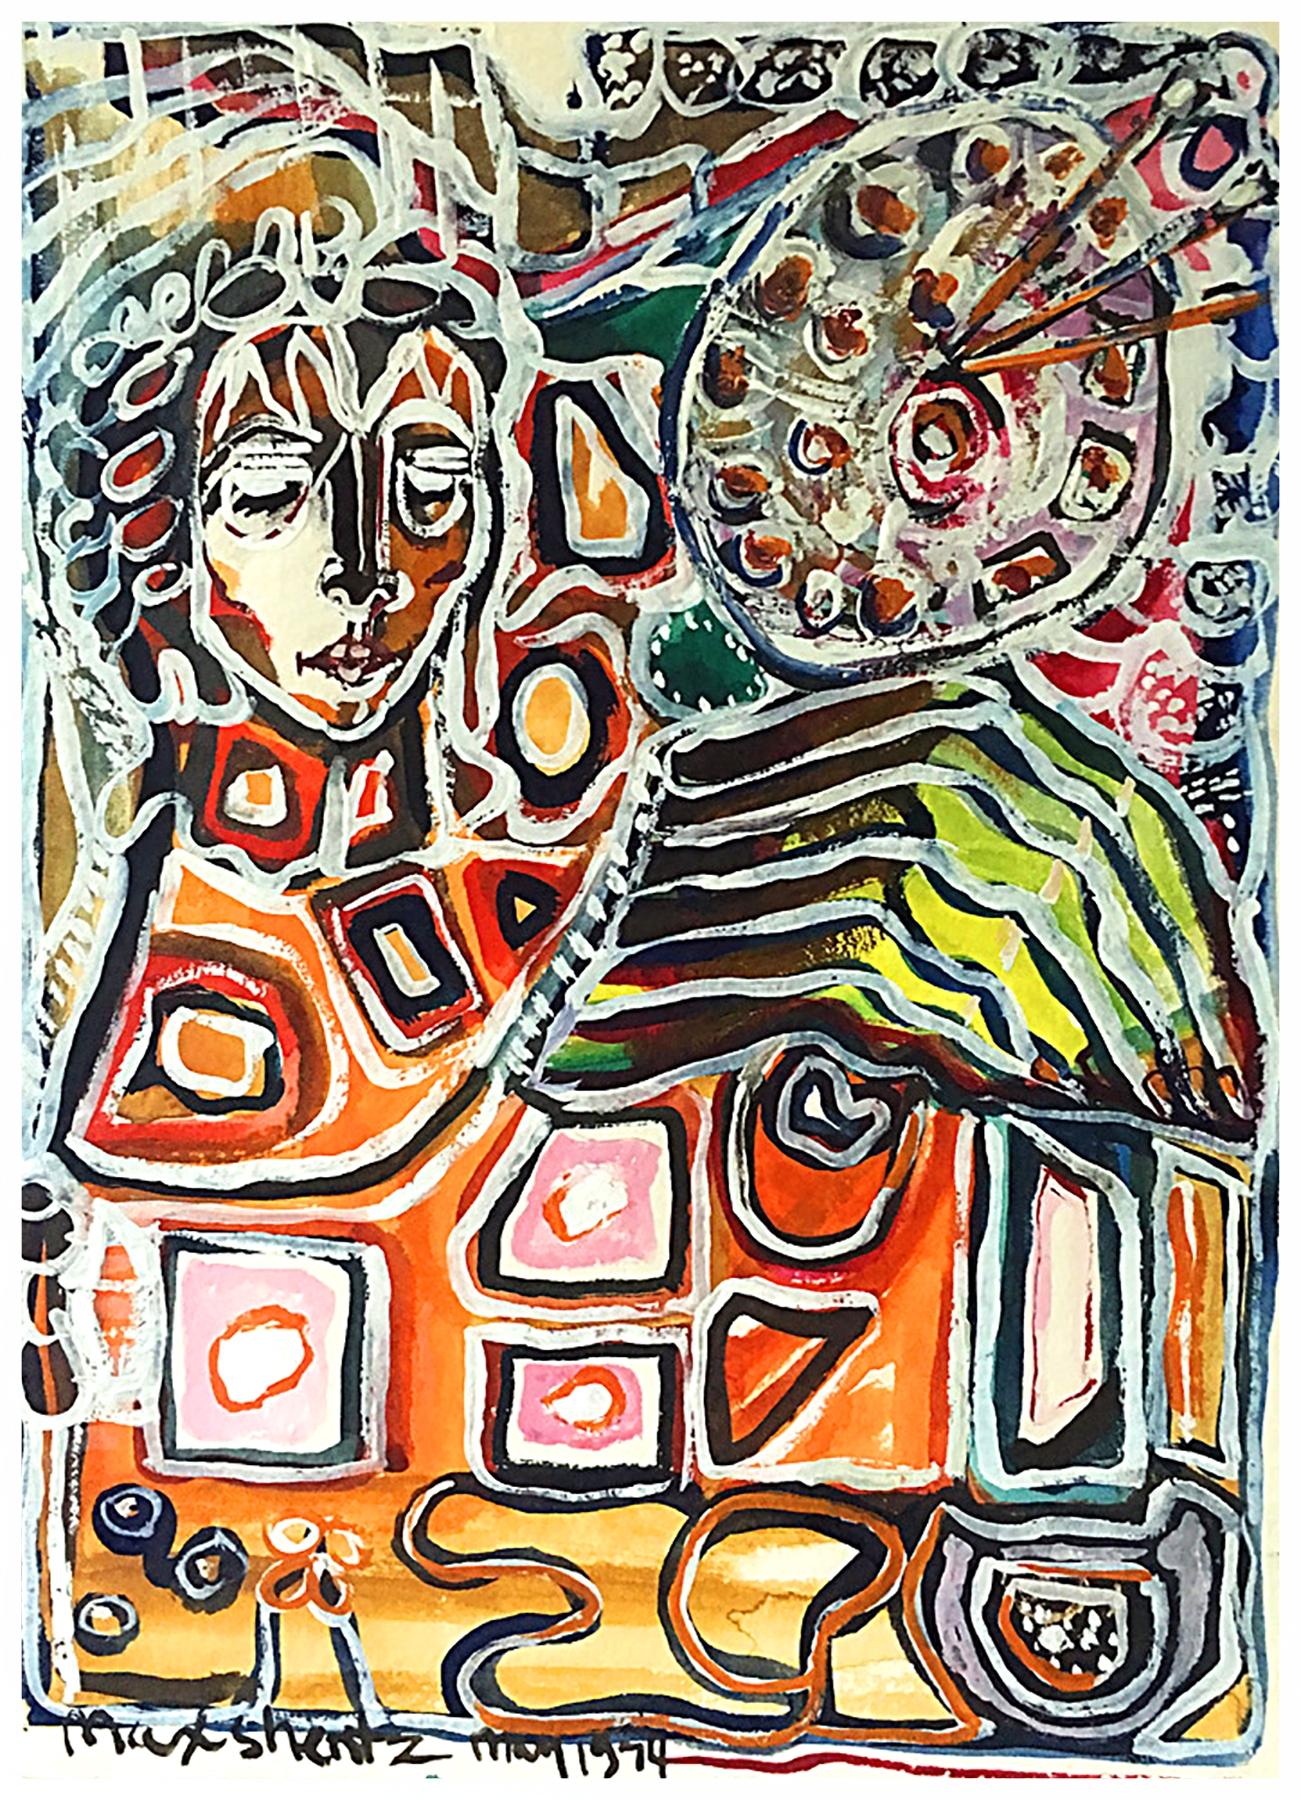 The Mosaic Lady 1974 12x9 Acrylic